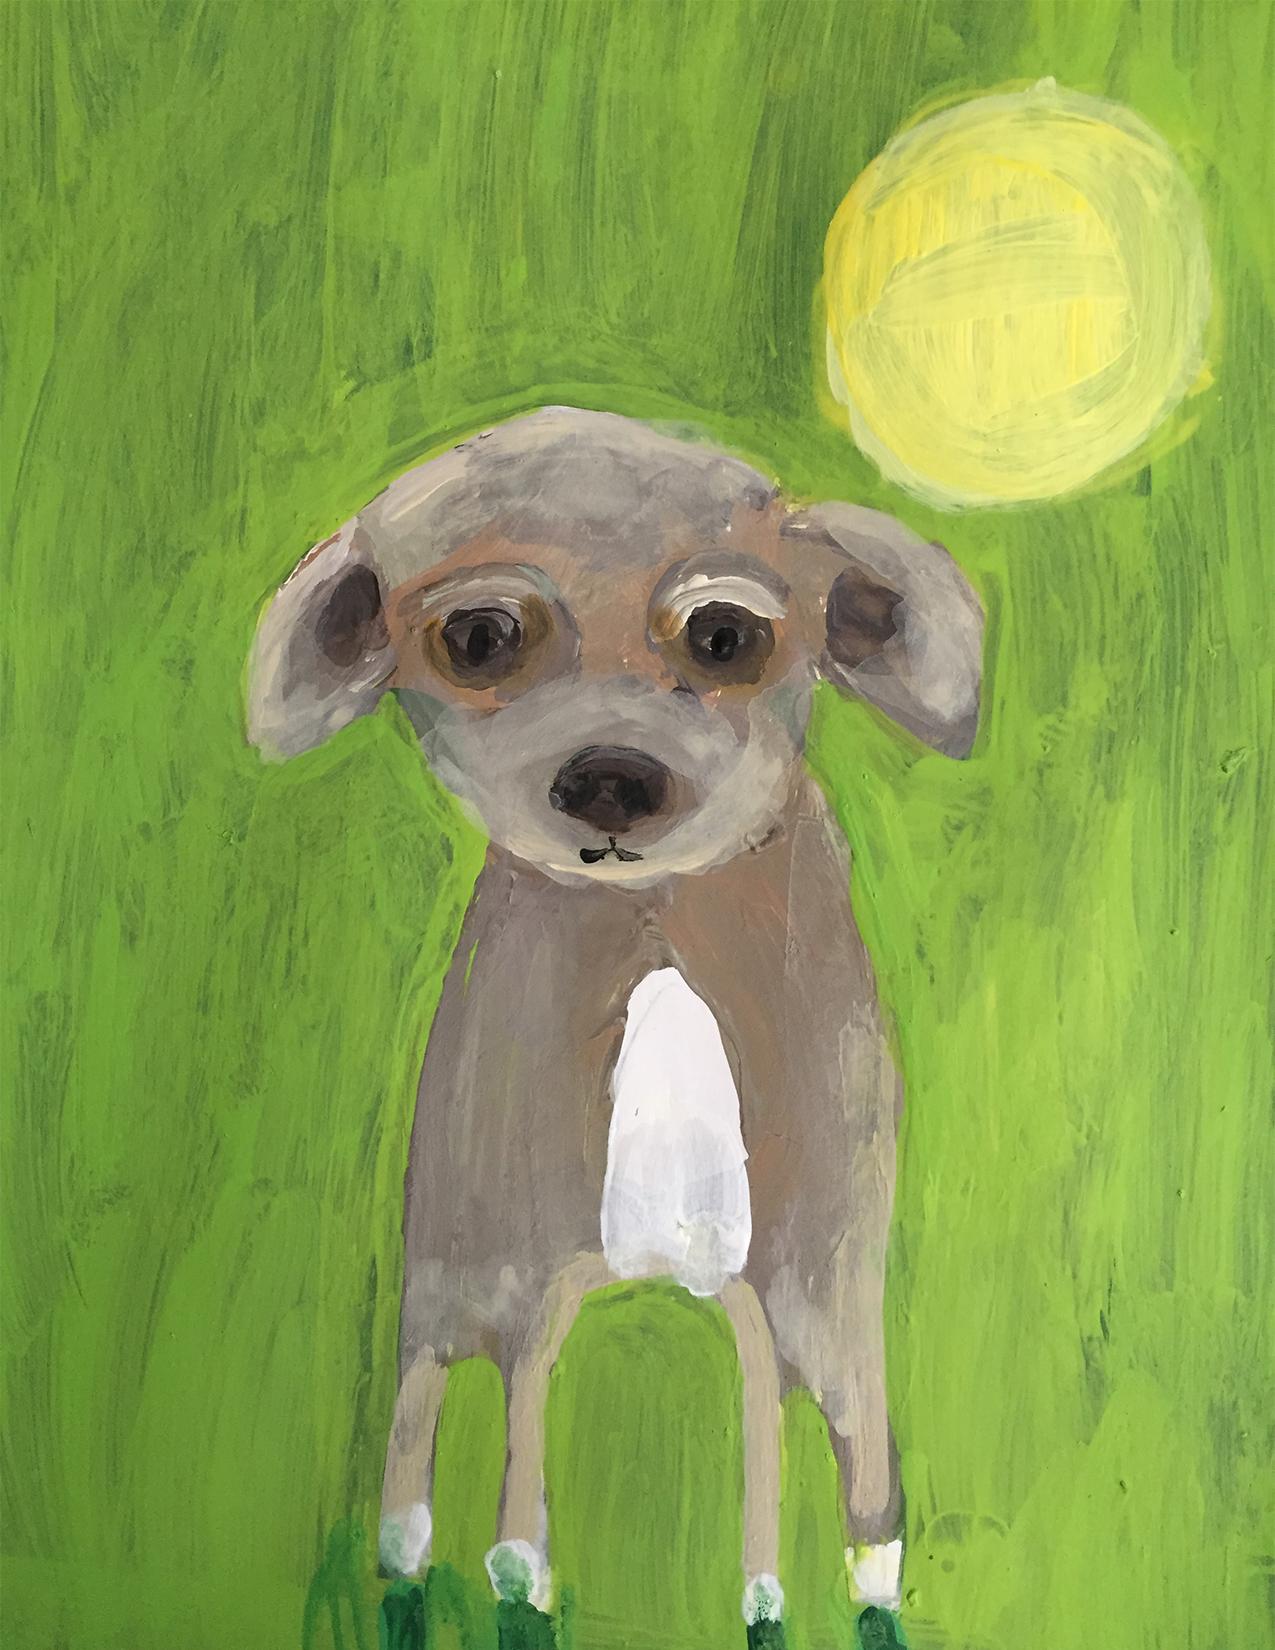 puppy green.jpg